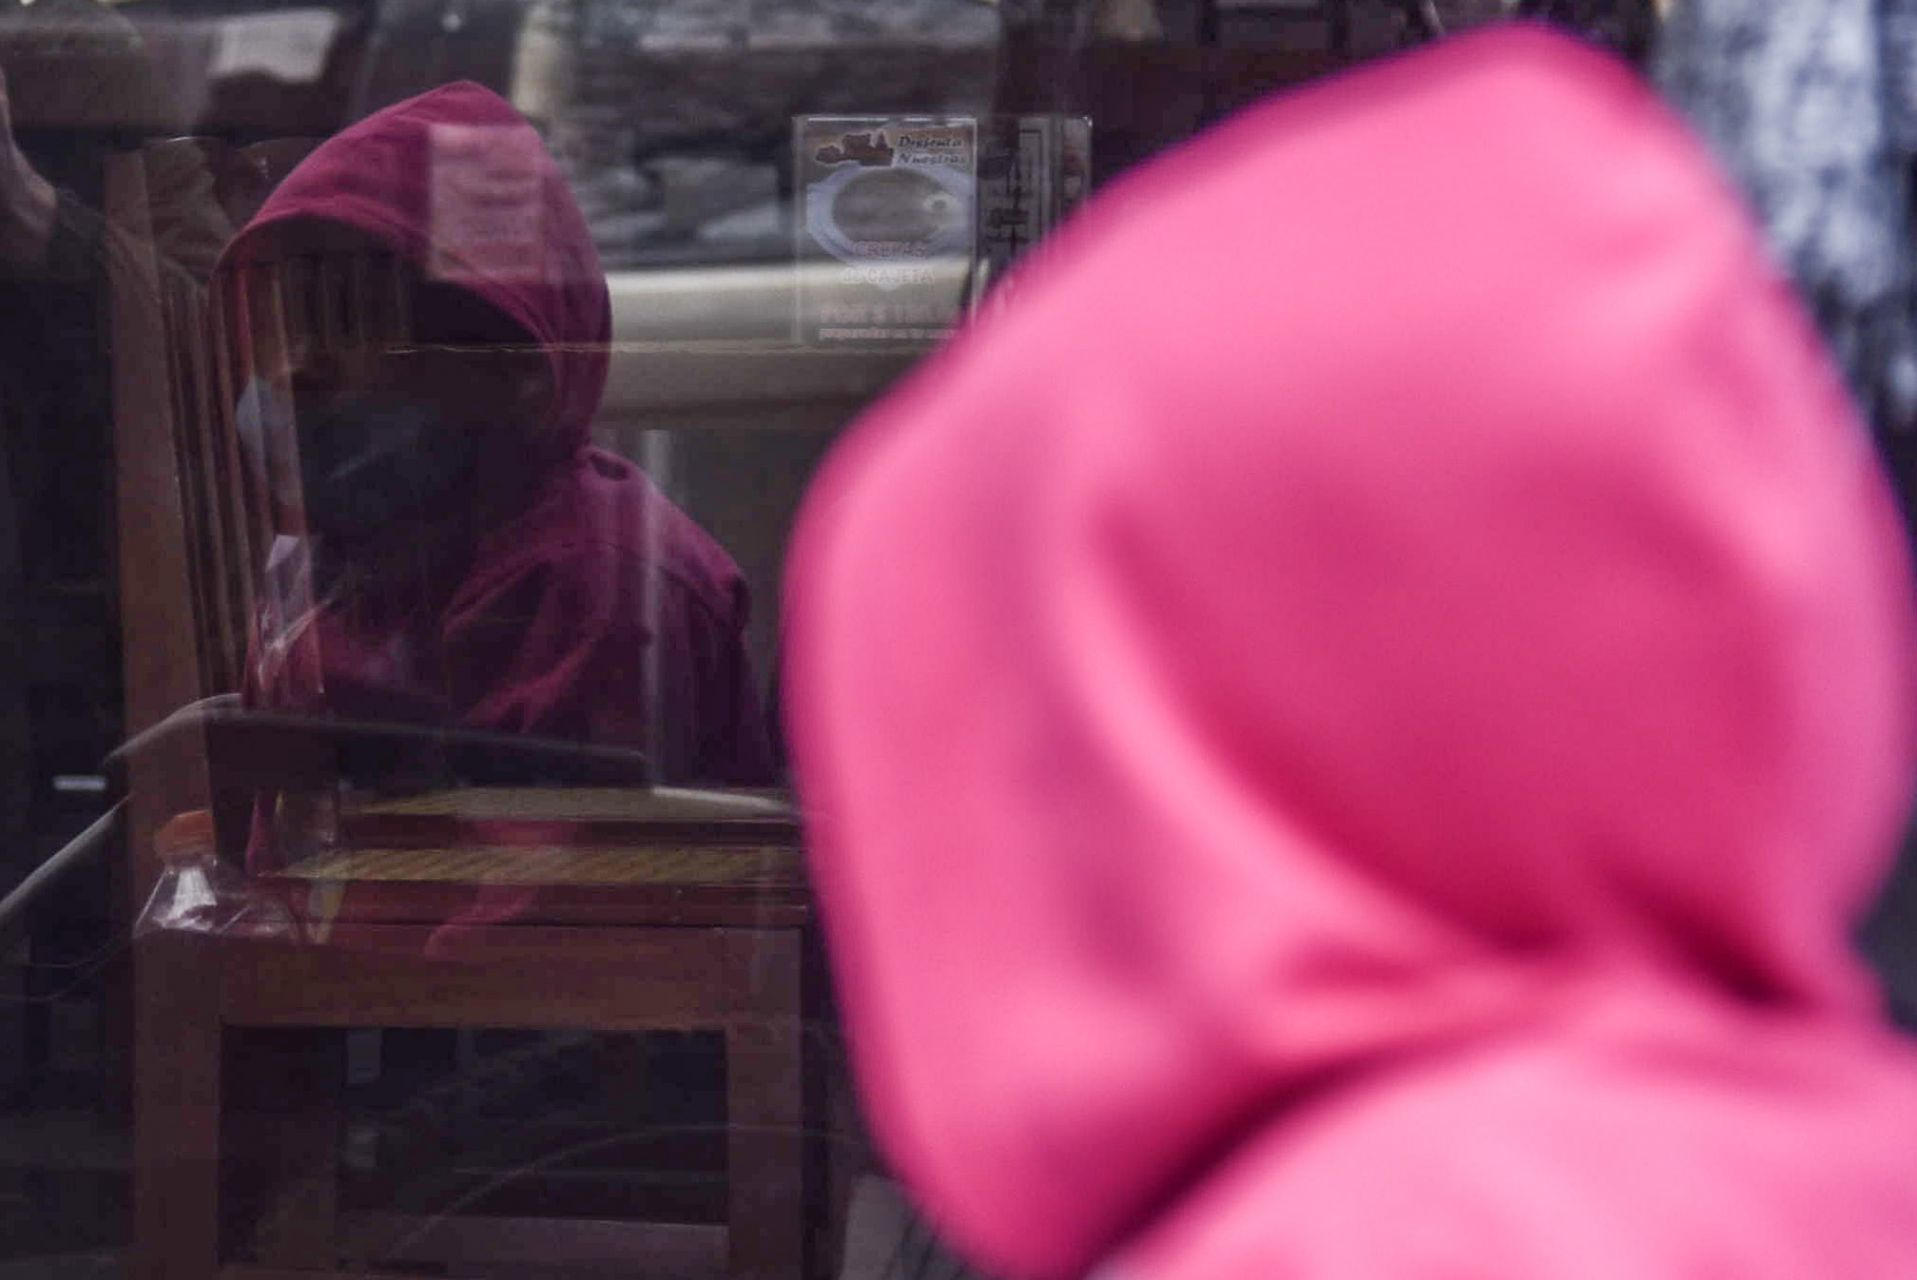 Padres de niños con cáncer alertan escasez de medicamento para quimioterapias en México